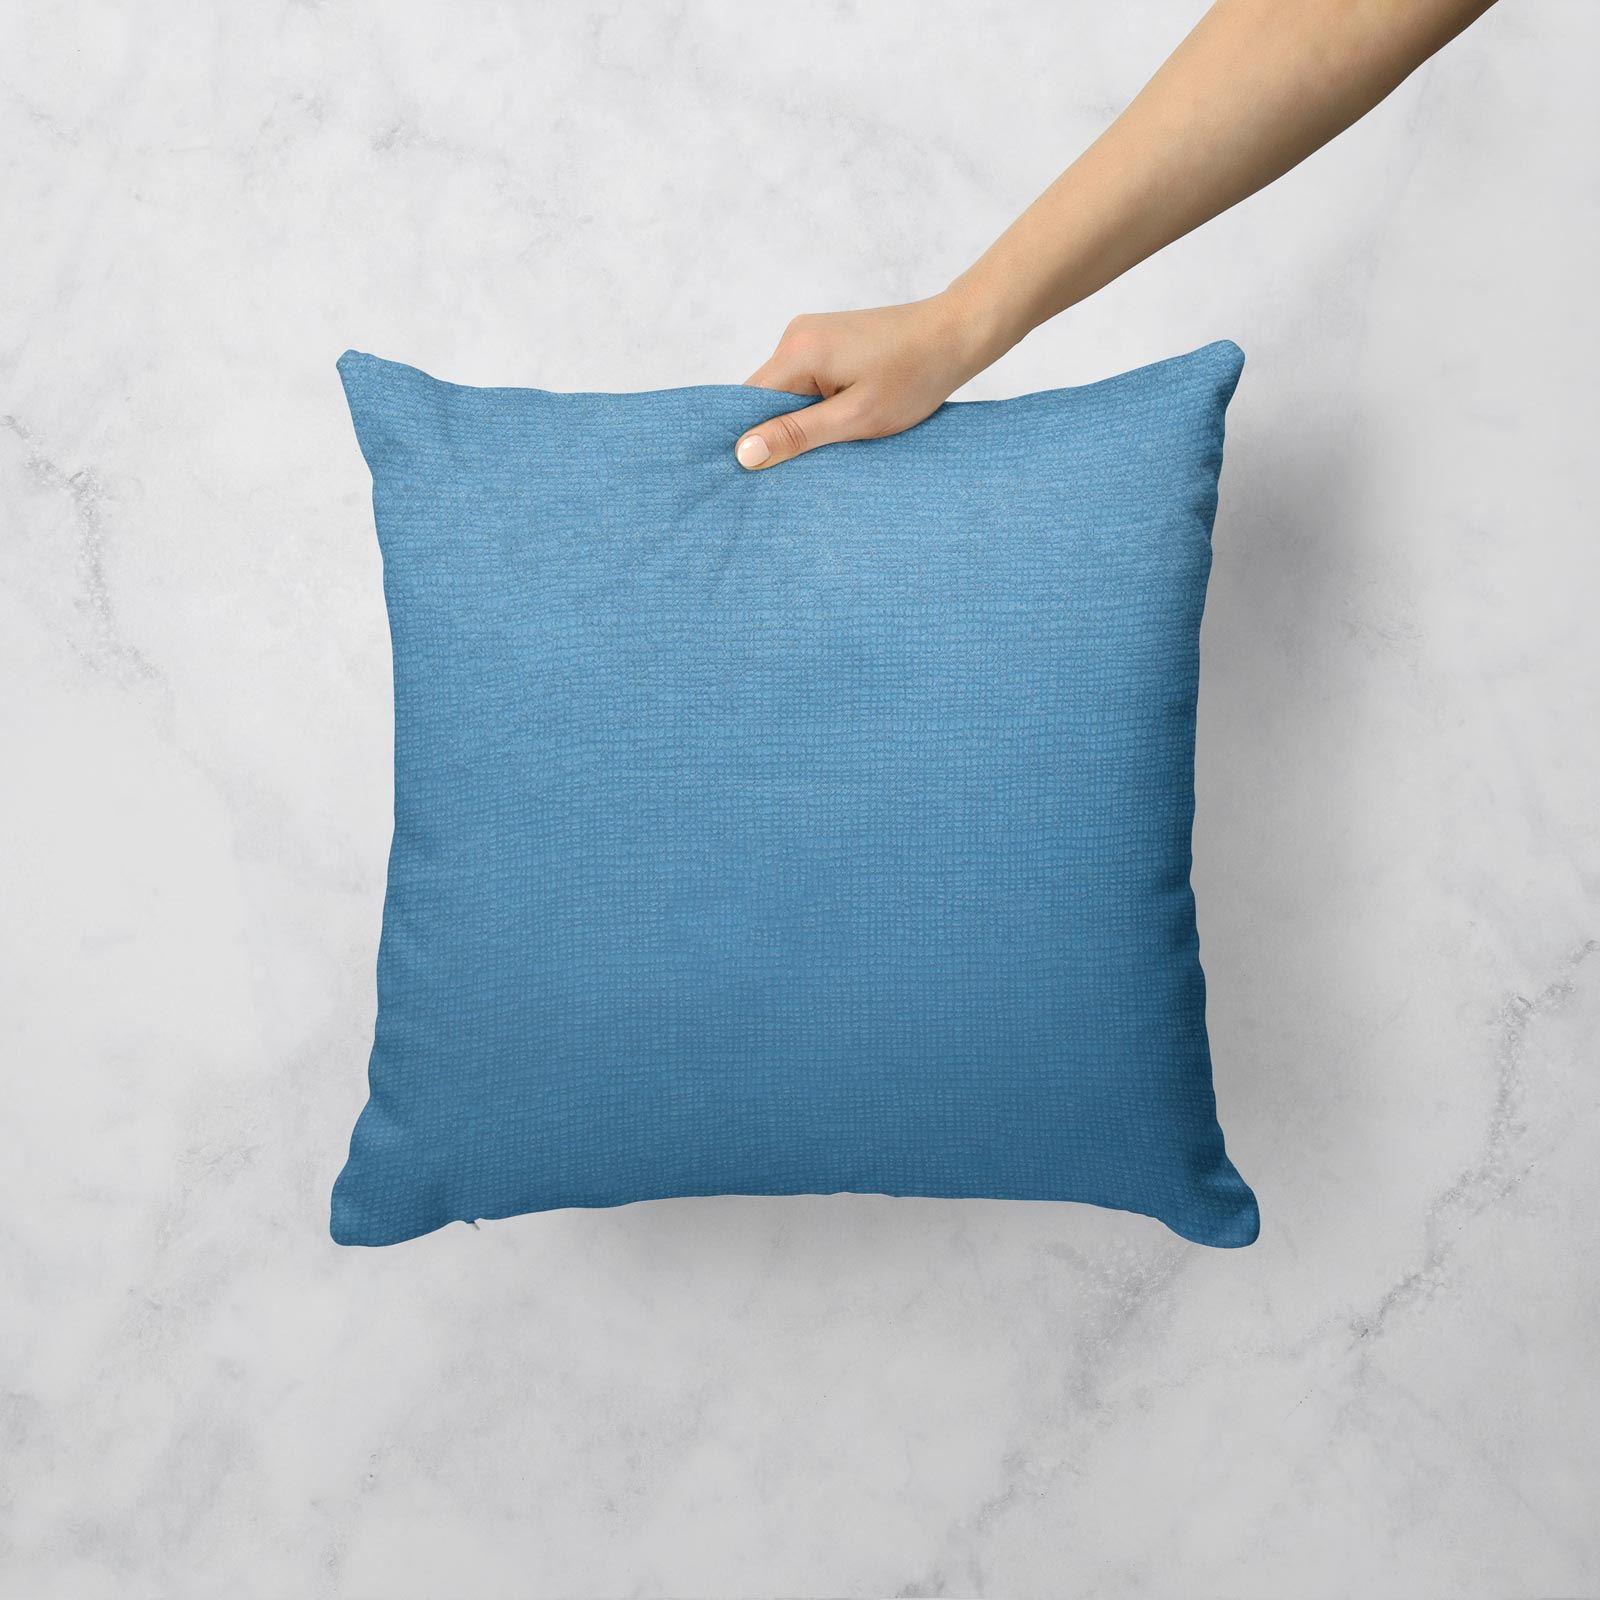 Teal-Blue-Duck-Egg-Cushion-Covers-18-034-x18-034-45cm-x-45cm-Luxury-Cover thumbnail 18